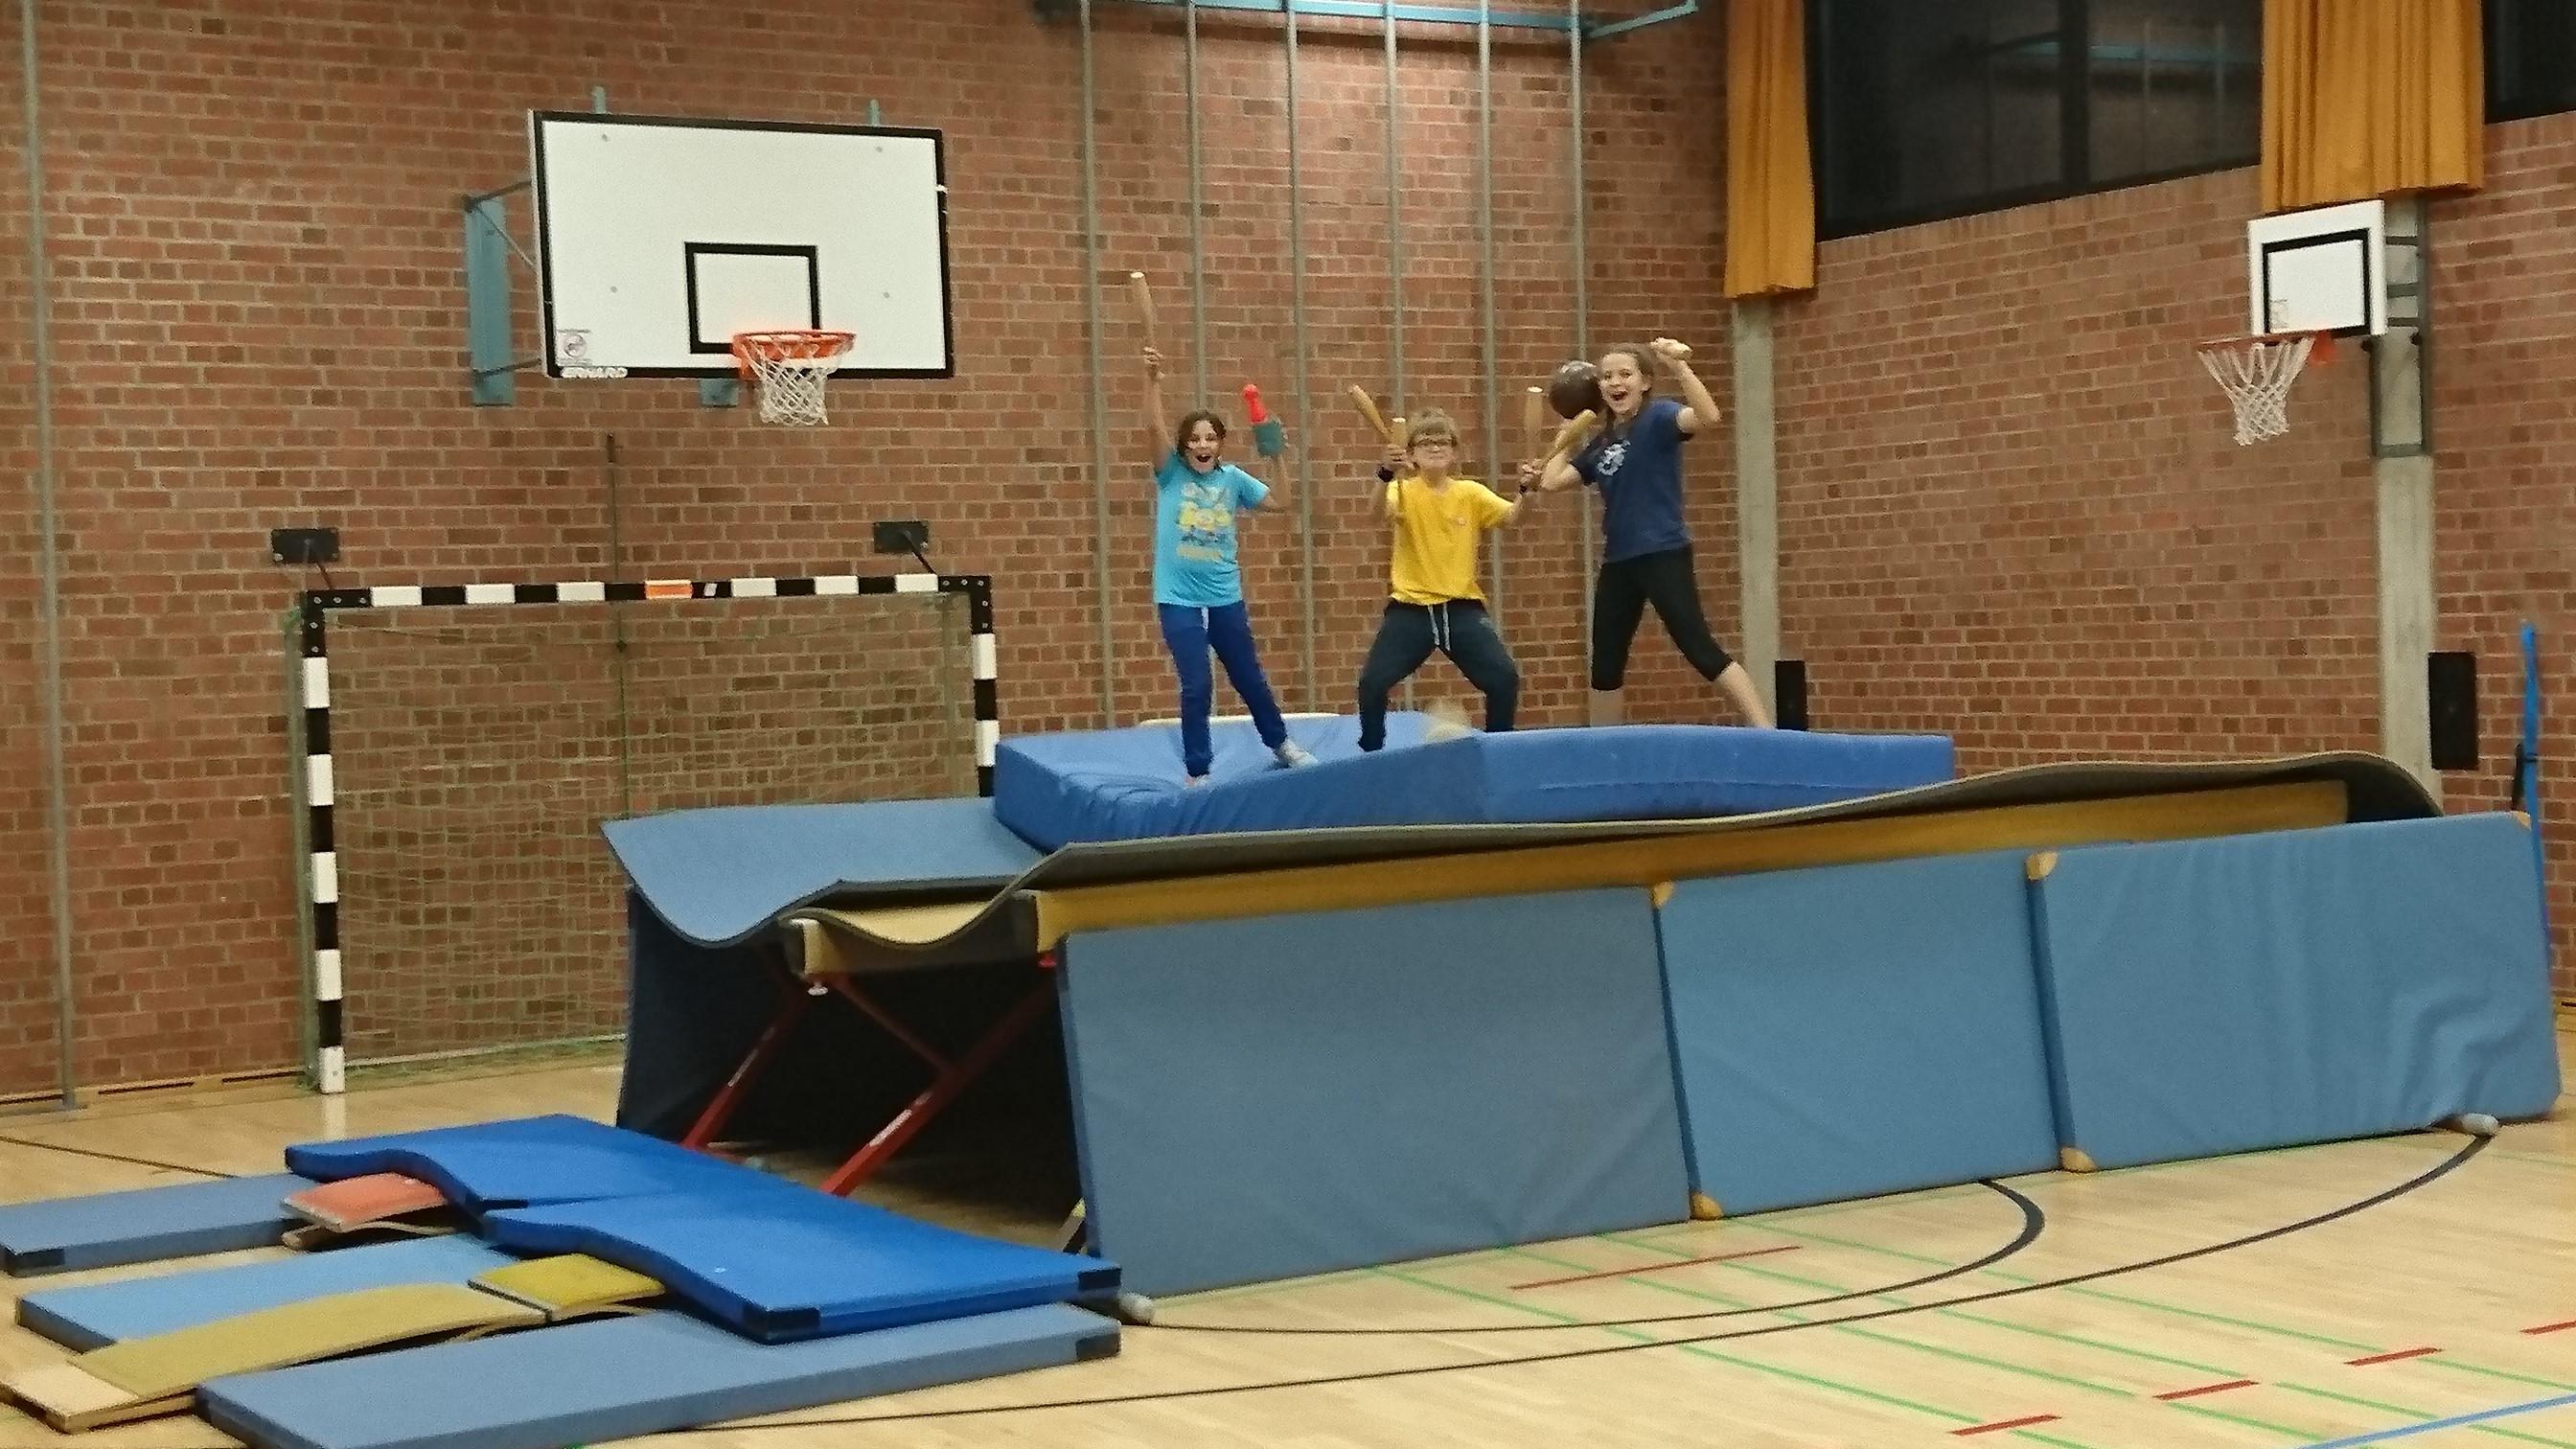 Kindersport Djk Sportbund Munchen E V